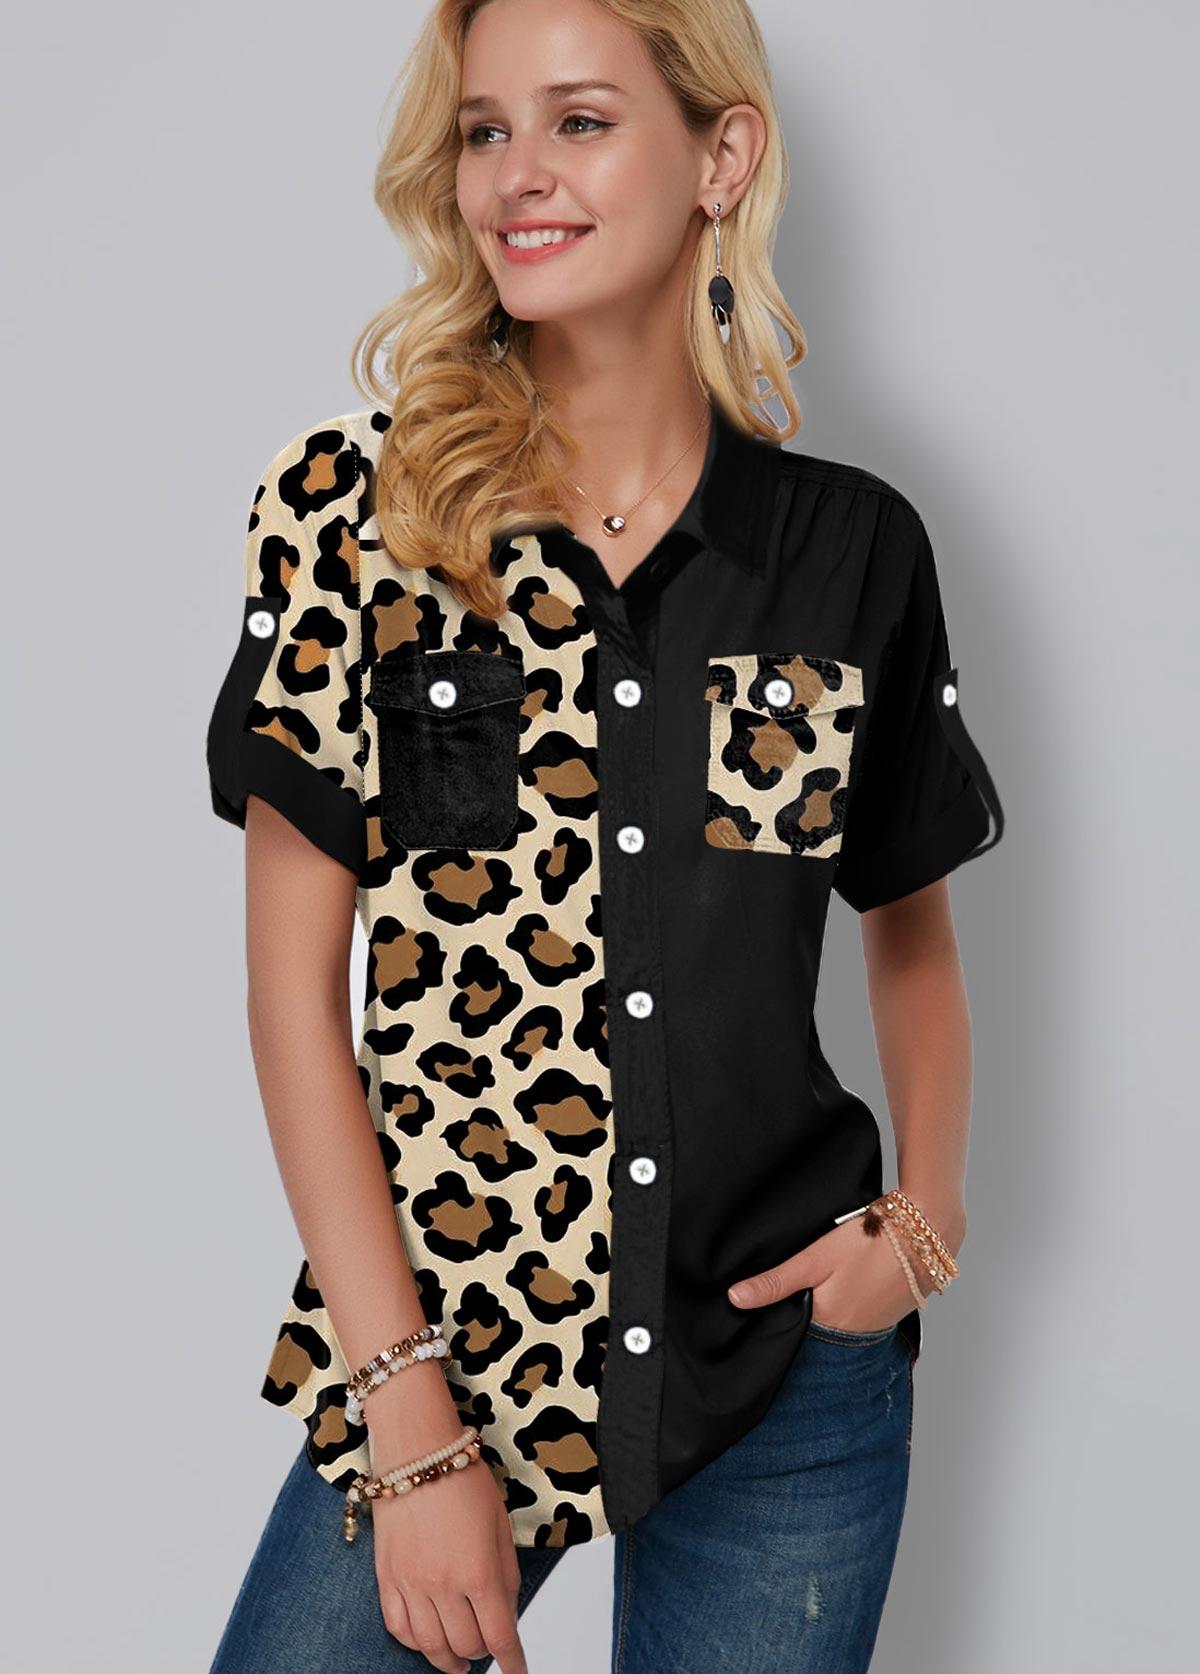 ROTITA Leopard Print Chest Pocket Button Up Blouse